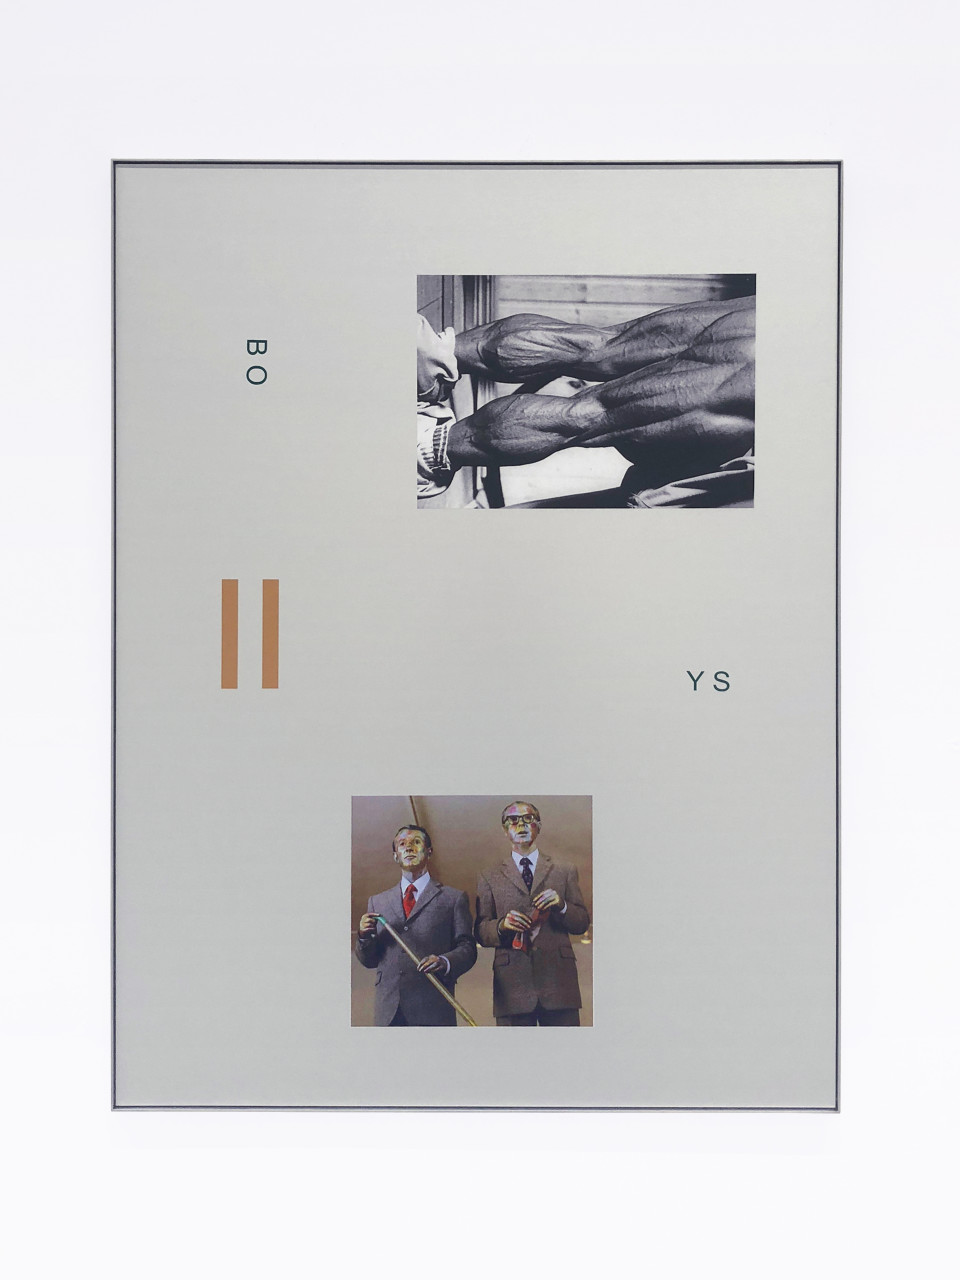 Simeon Barclay Playing mass, 2014 Aluminium, vinyl adhesive 119 x 90 x 2.5 cm 46 7/8 x 35 3/8 x 1 in